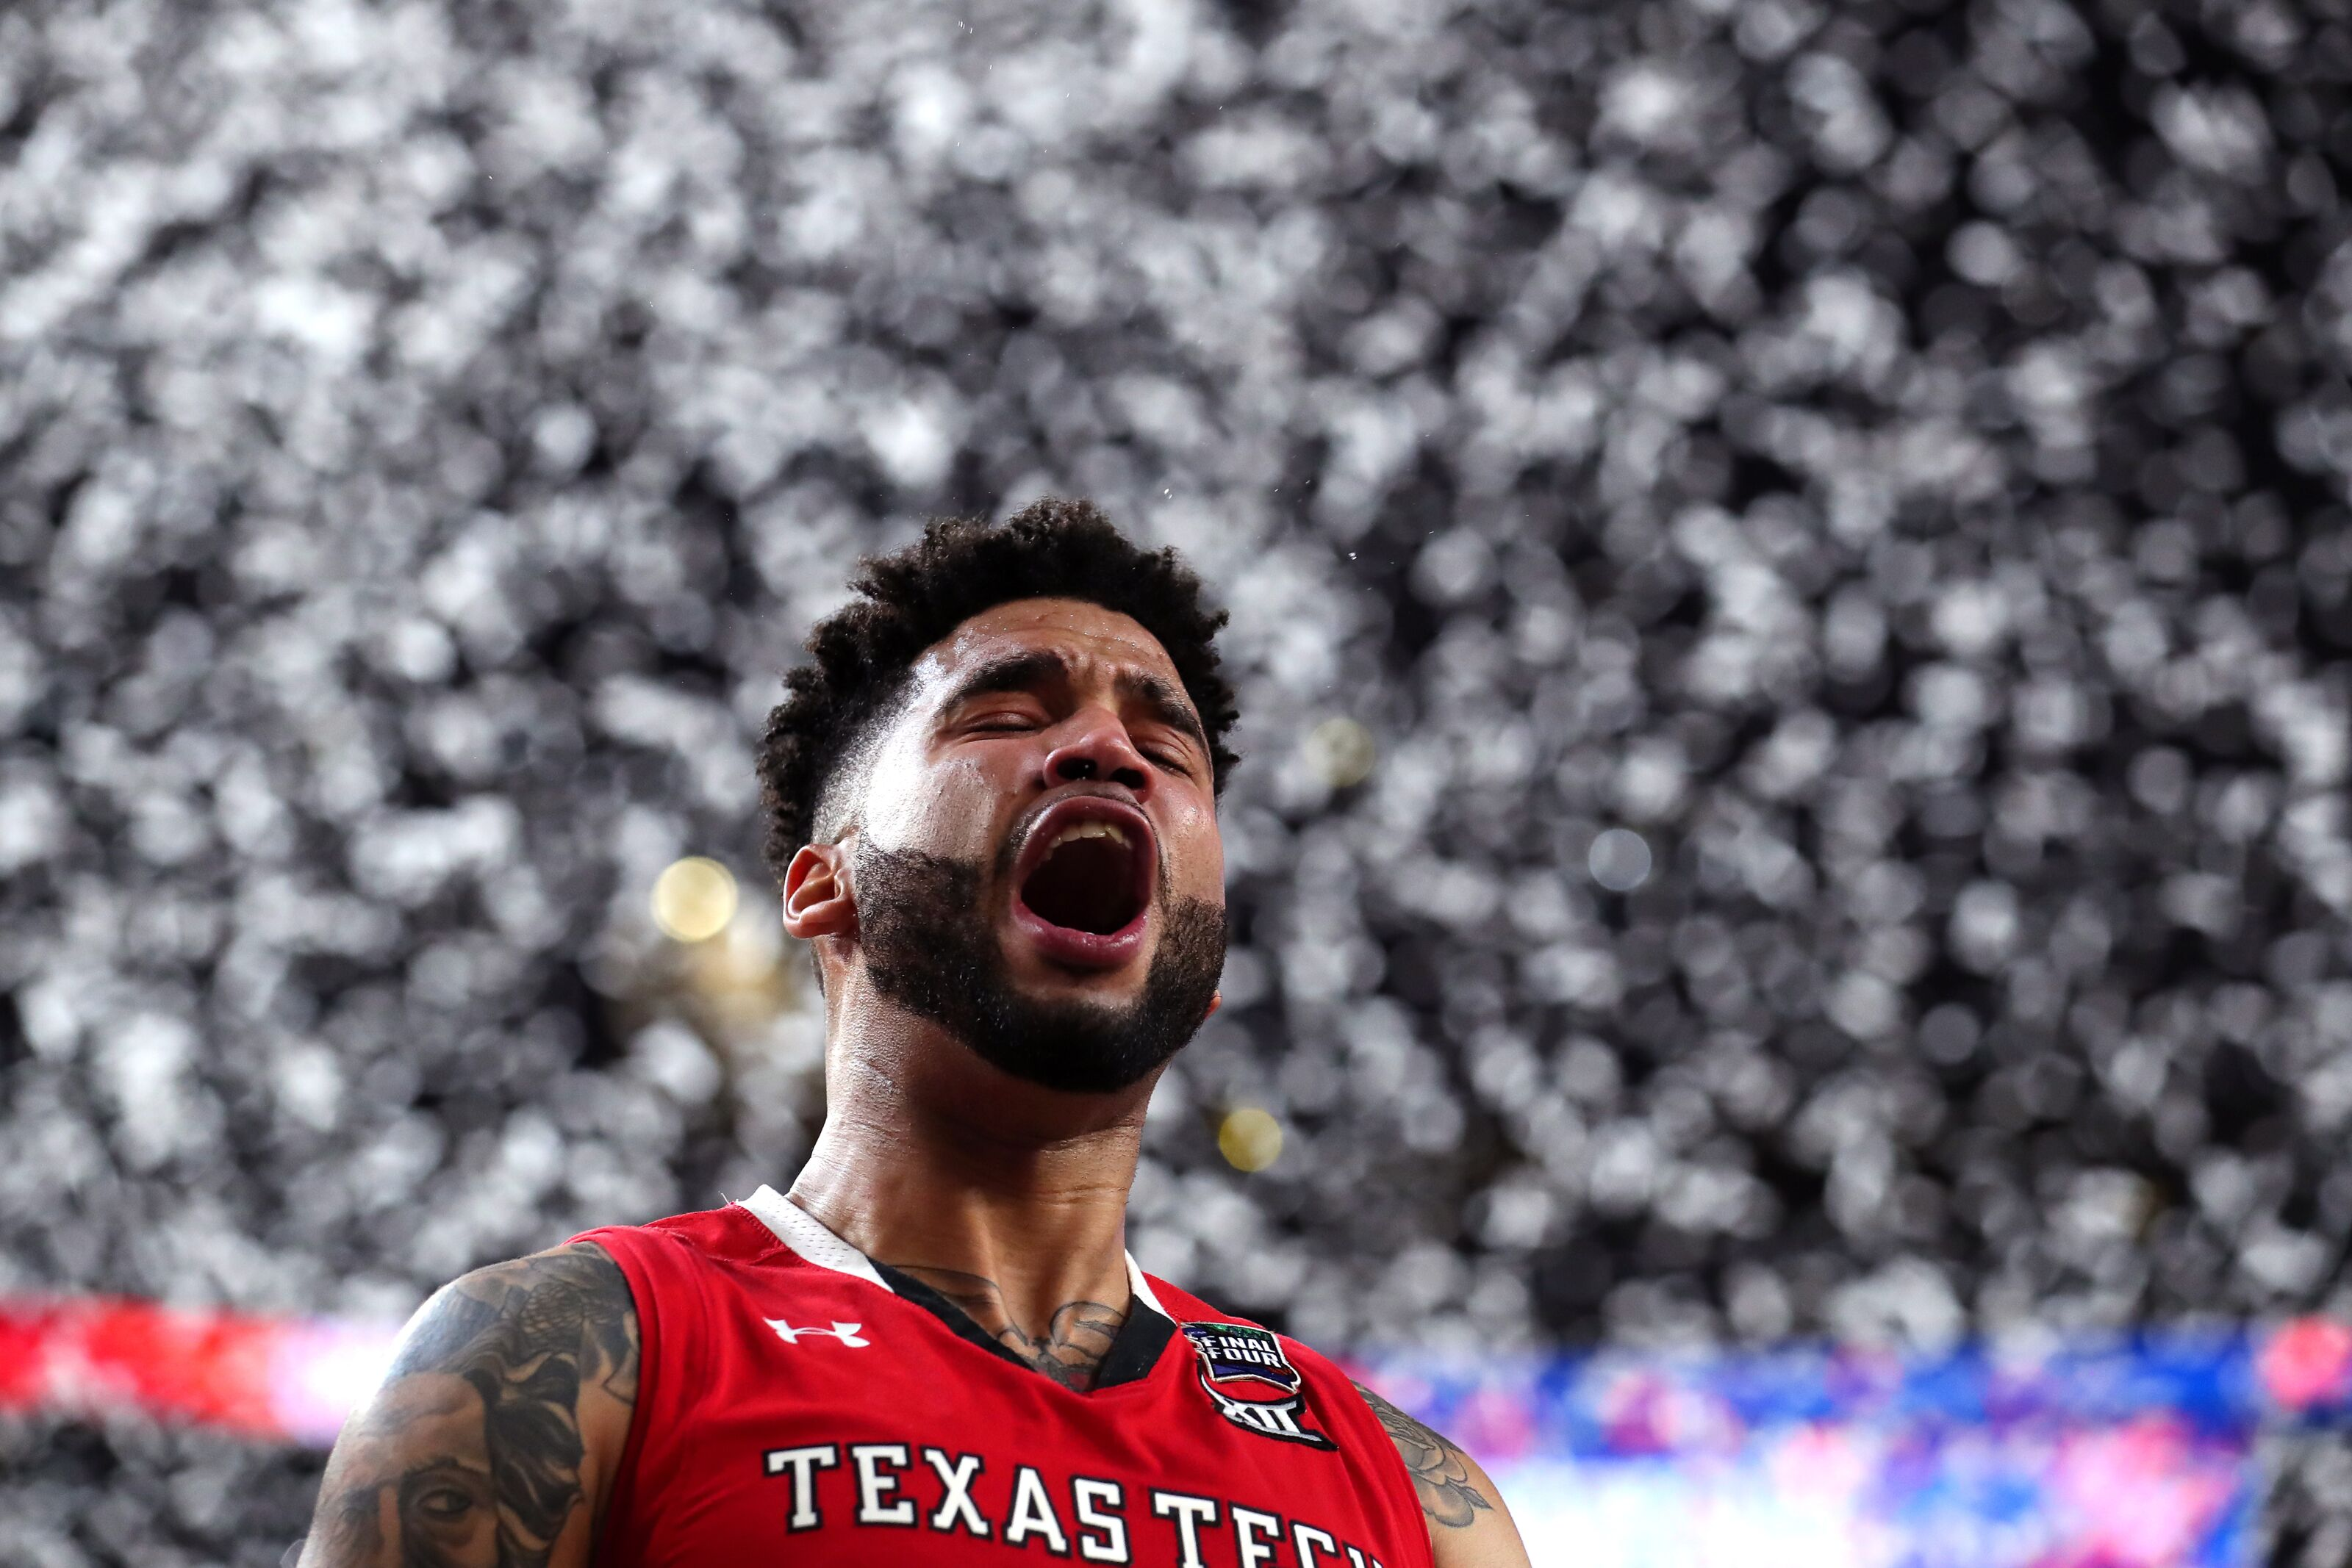 Big 12 Basketball: Way-too-early preseason power rankings for 2019-20